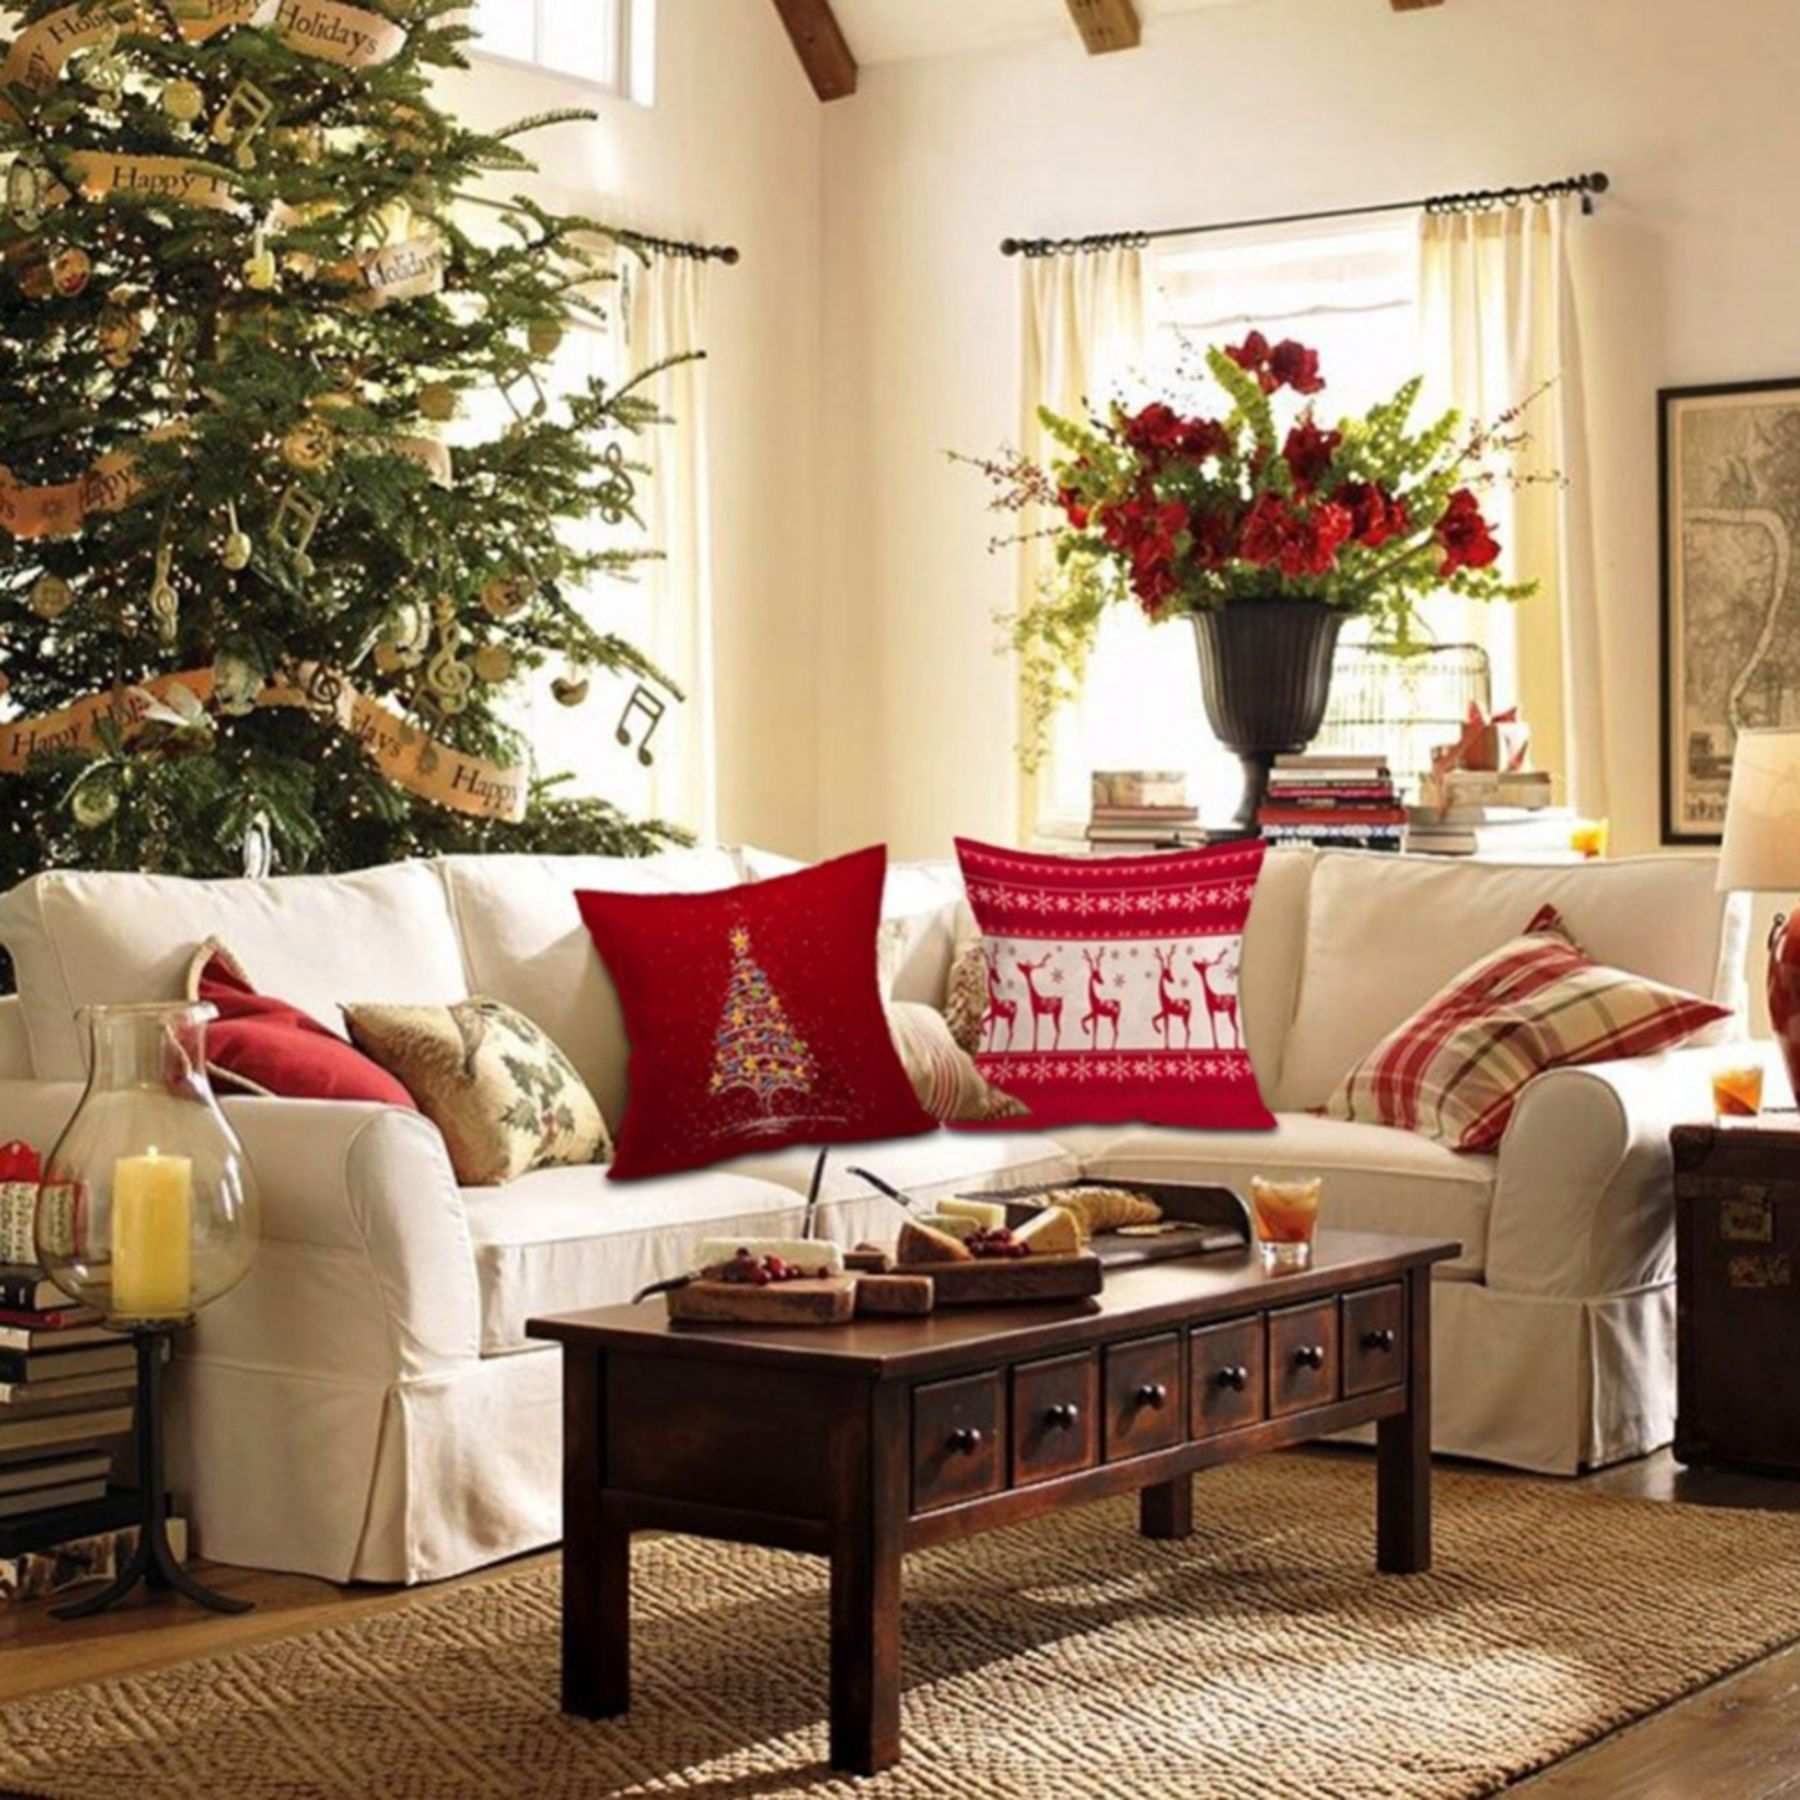 Best 10 Christmas Living Room Decorating Ideas For Your Home Christmas Decorations Living Room Christmas Living Rooms Christmas Lounge